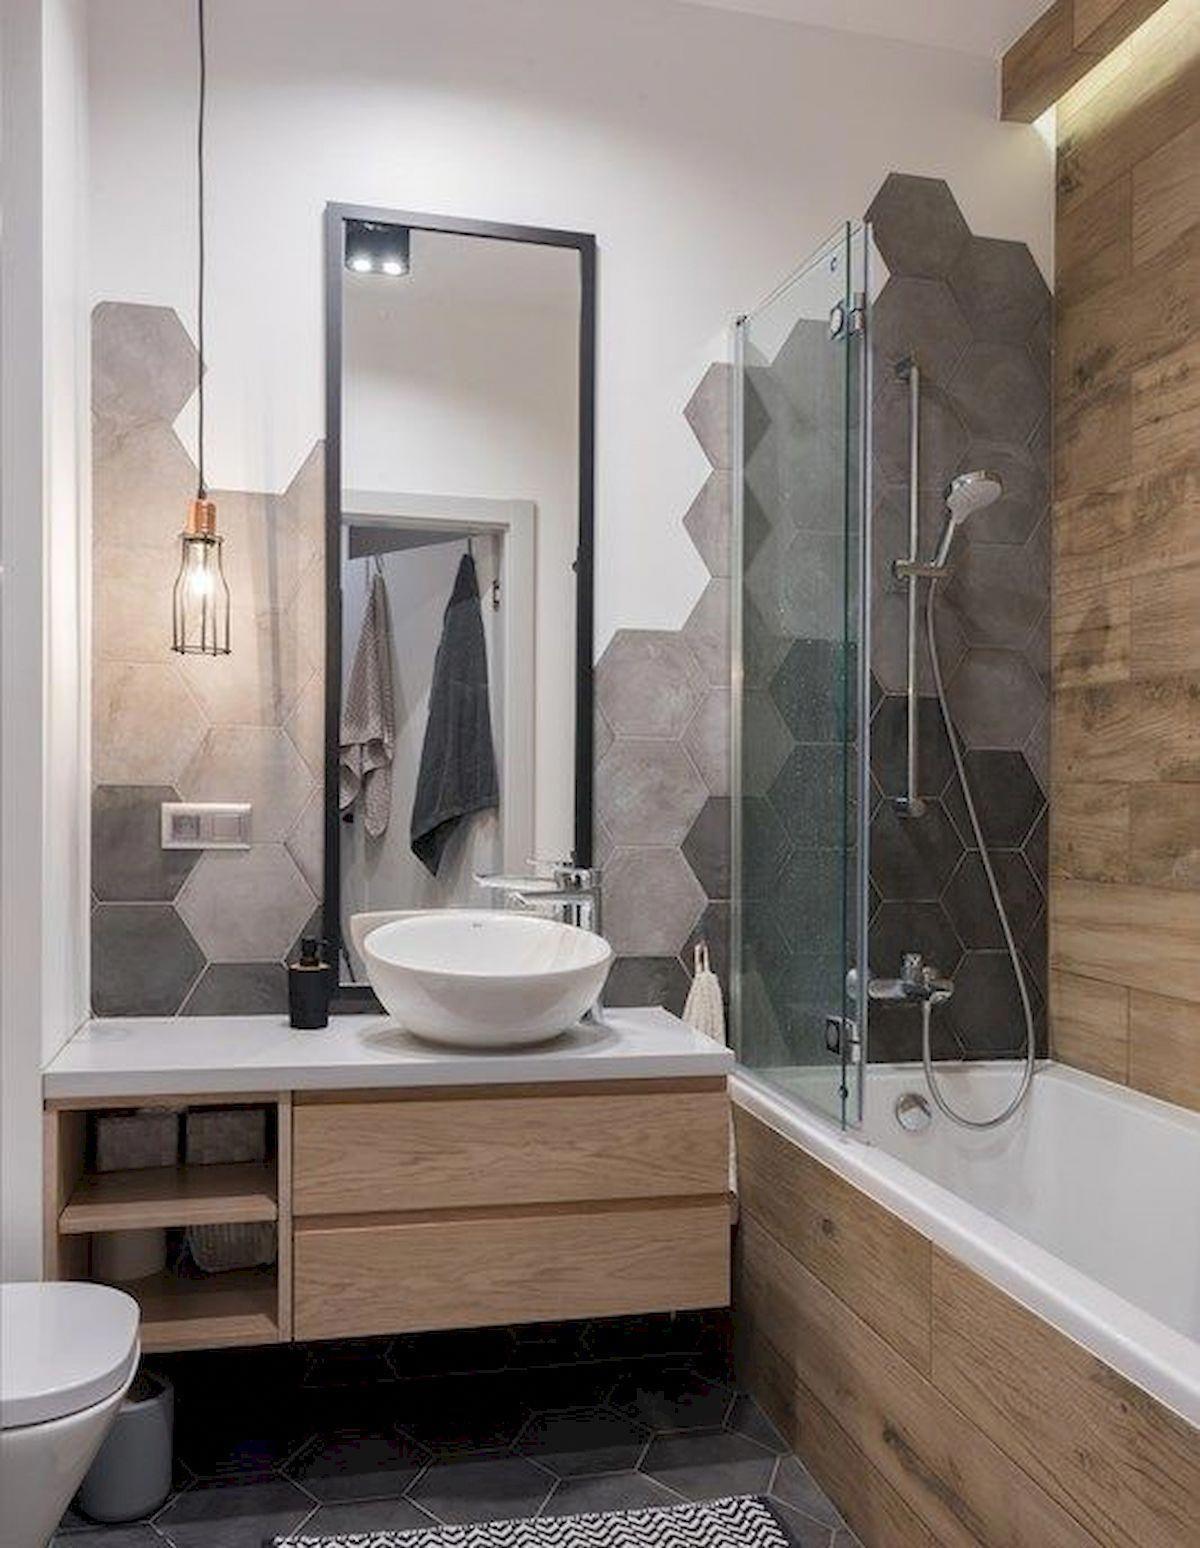 Bathroom Design Decor 7 Great Ideas For Your Bathroom Remodel En 2020 Idee Salle De Bain Salle De Bain Design Idees Salle De Bain